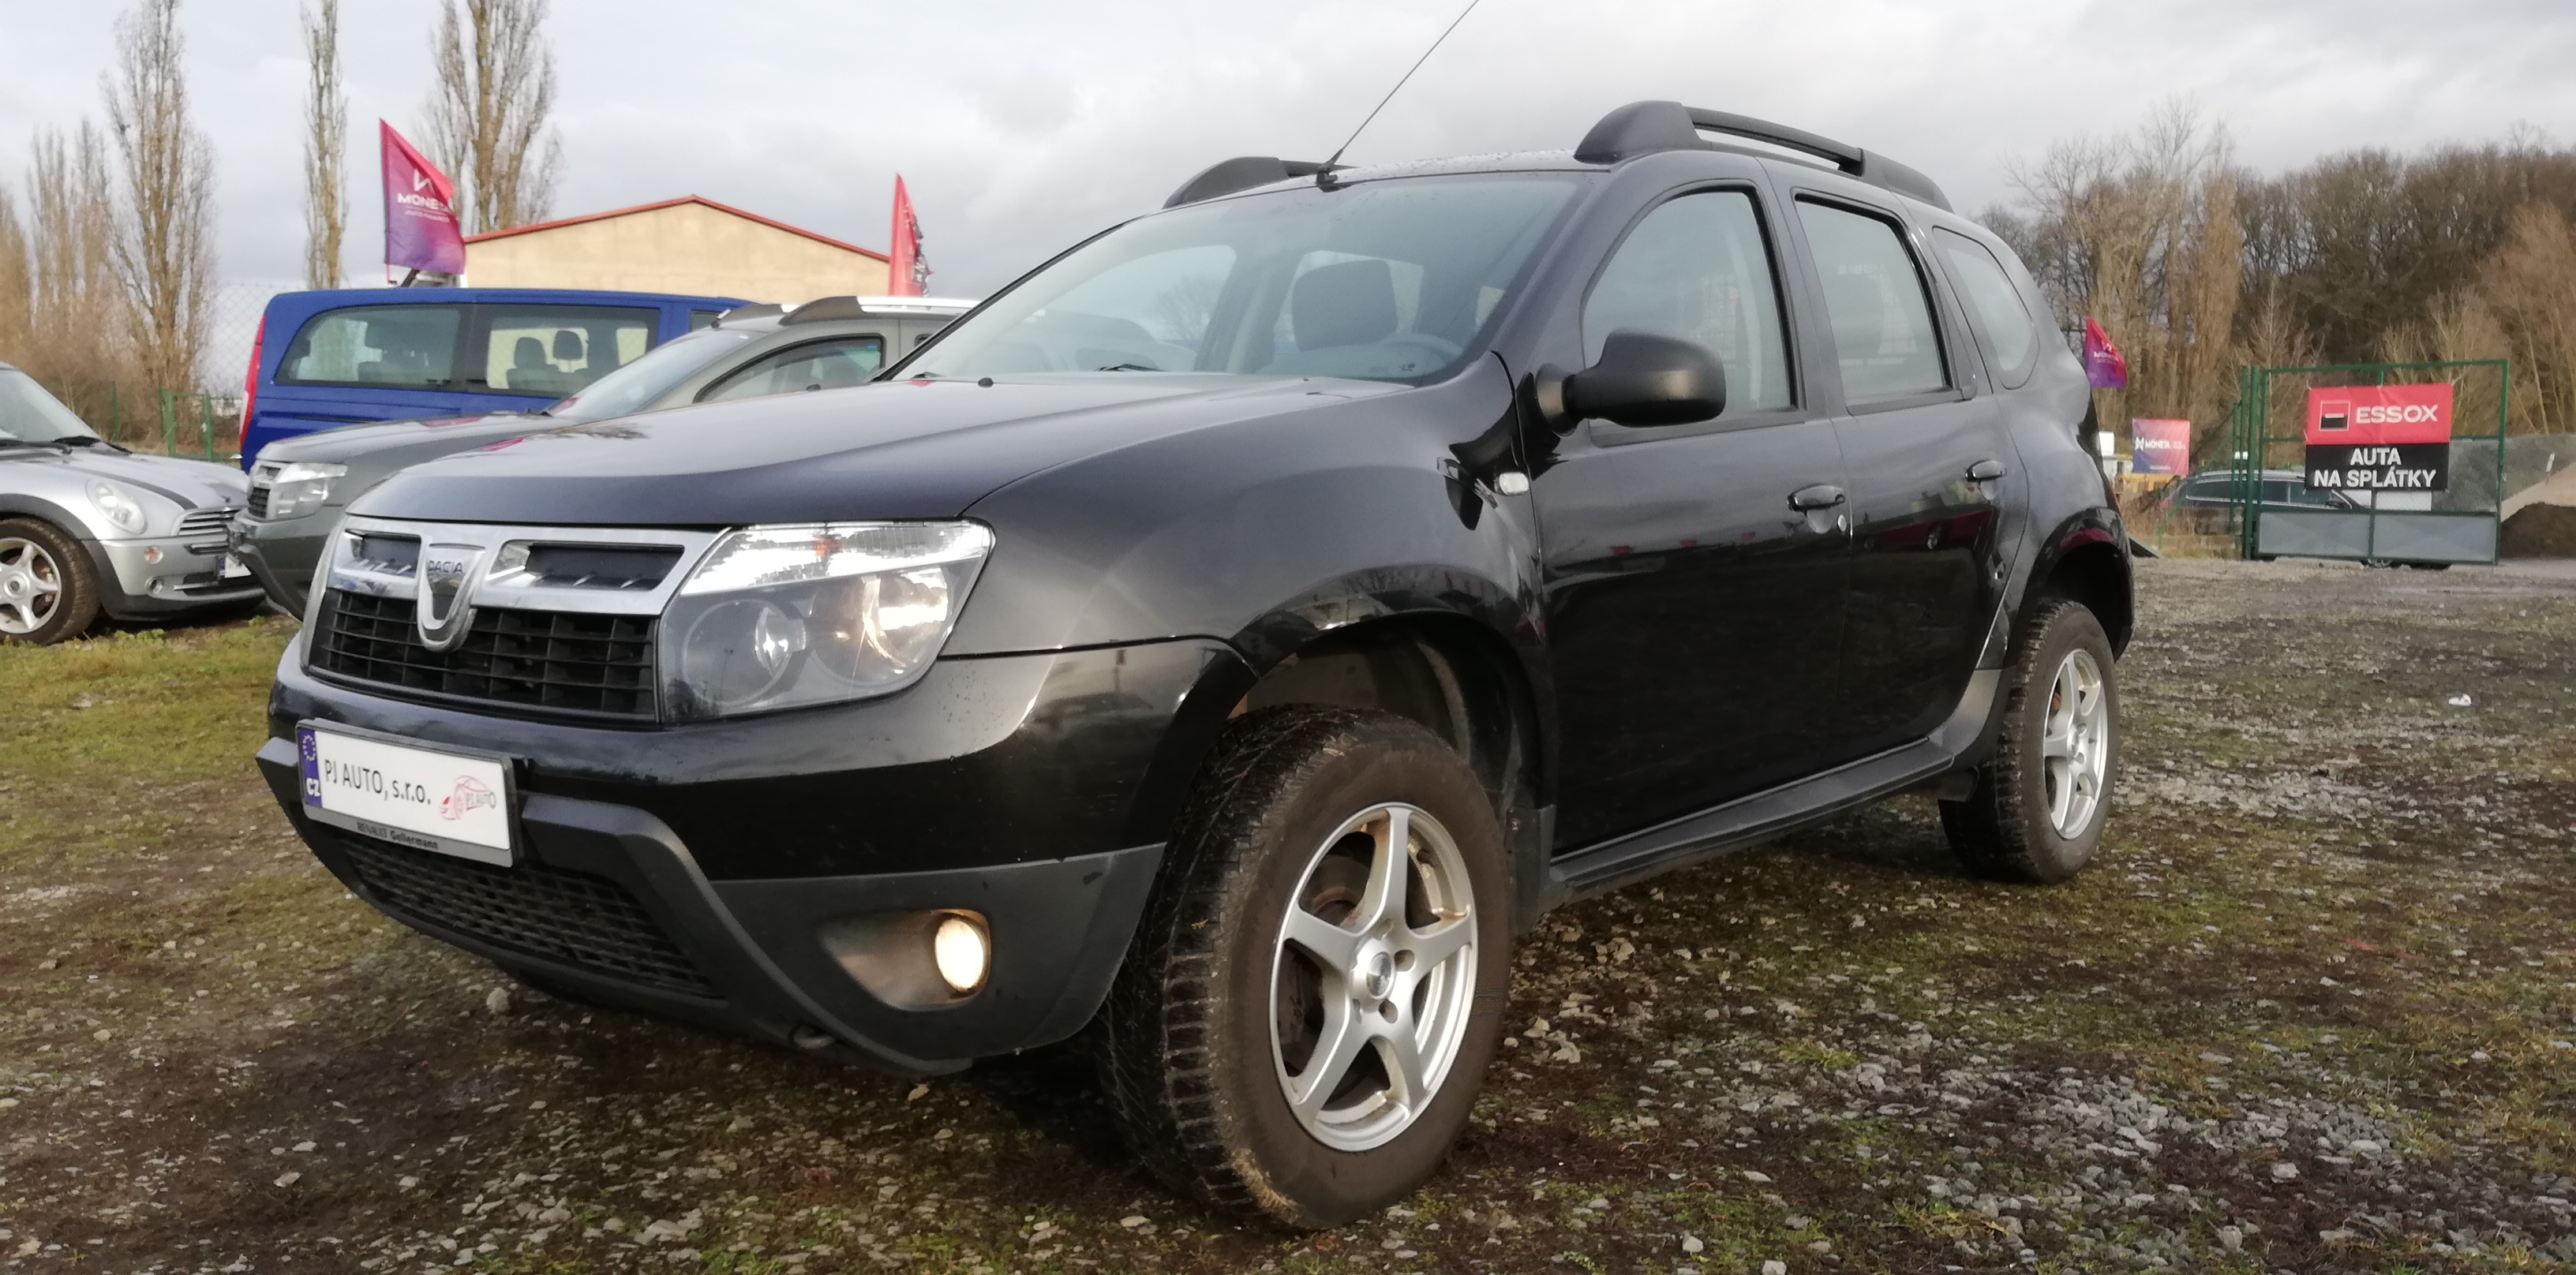 Dacia Duster 1.6 16V 77kW Laureate,Klima,ALU,2maj,96tkm